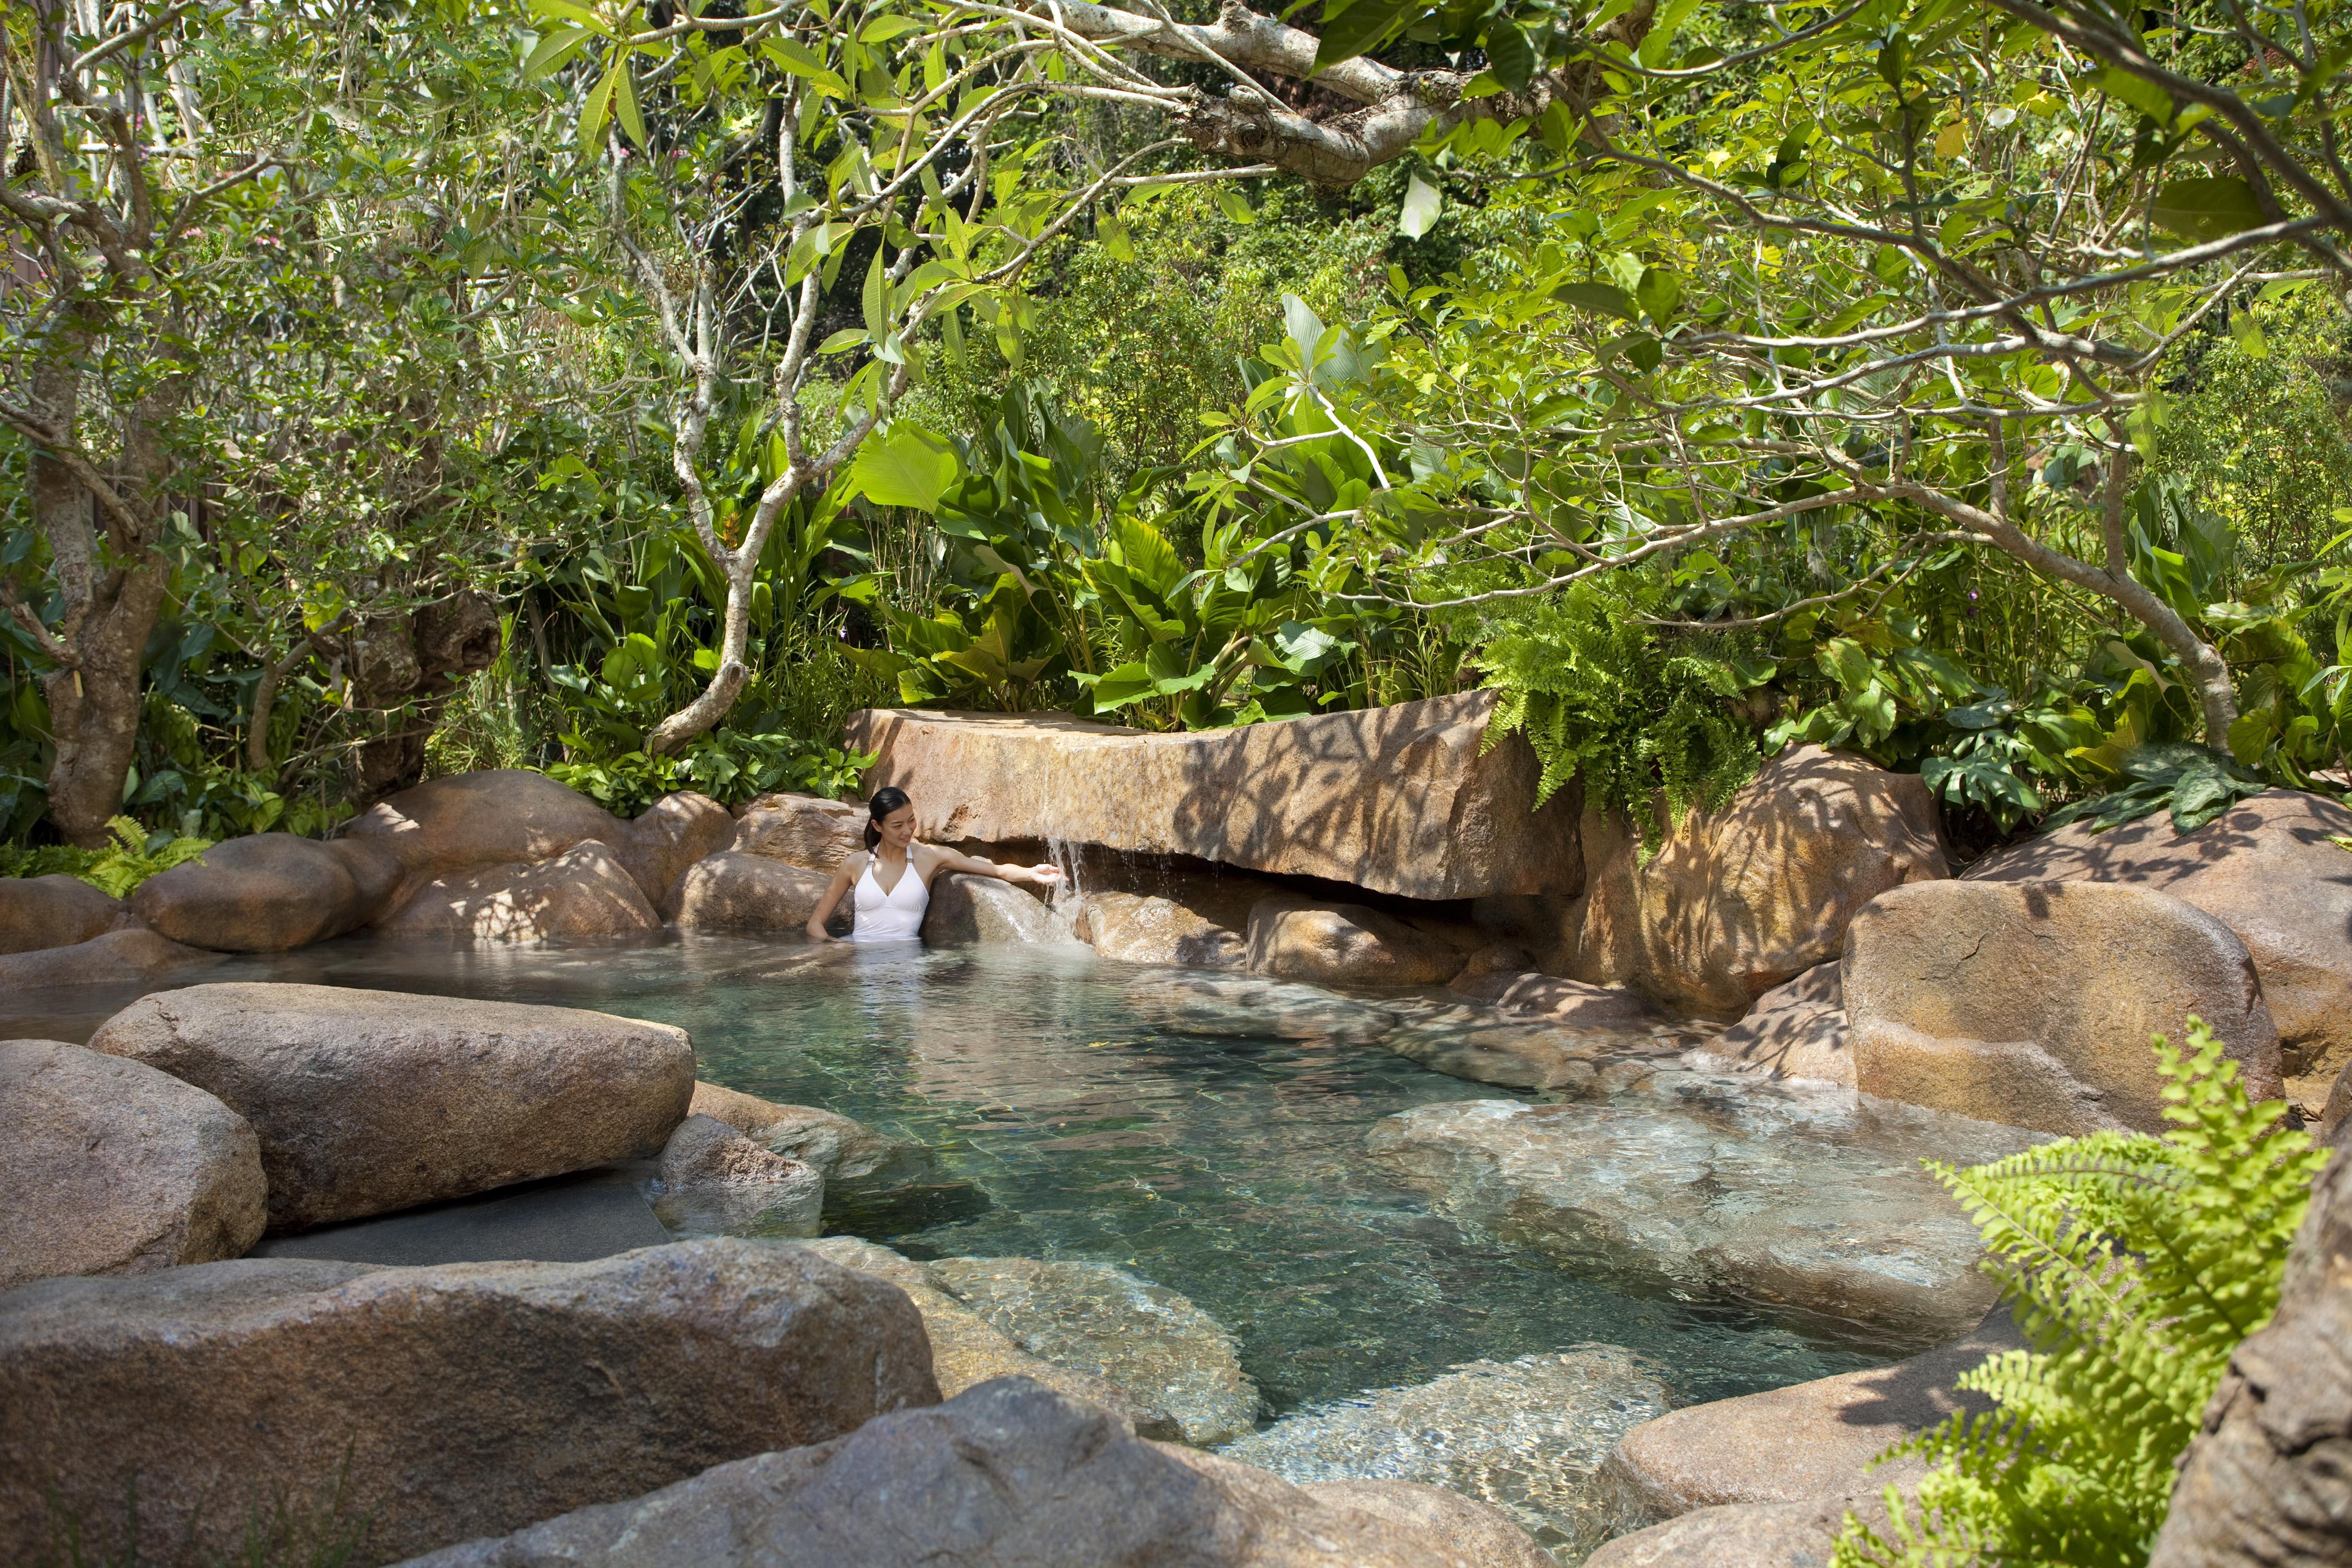 Espa onsen style pool